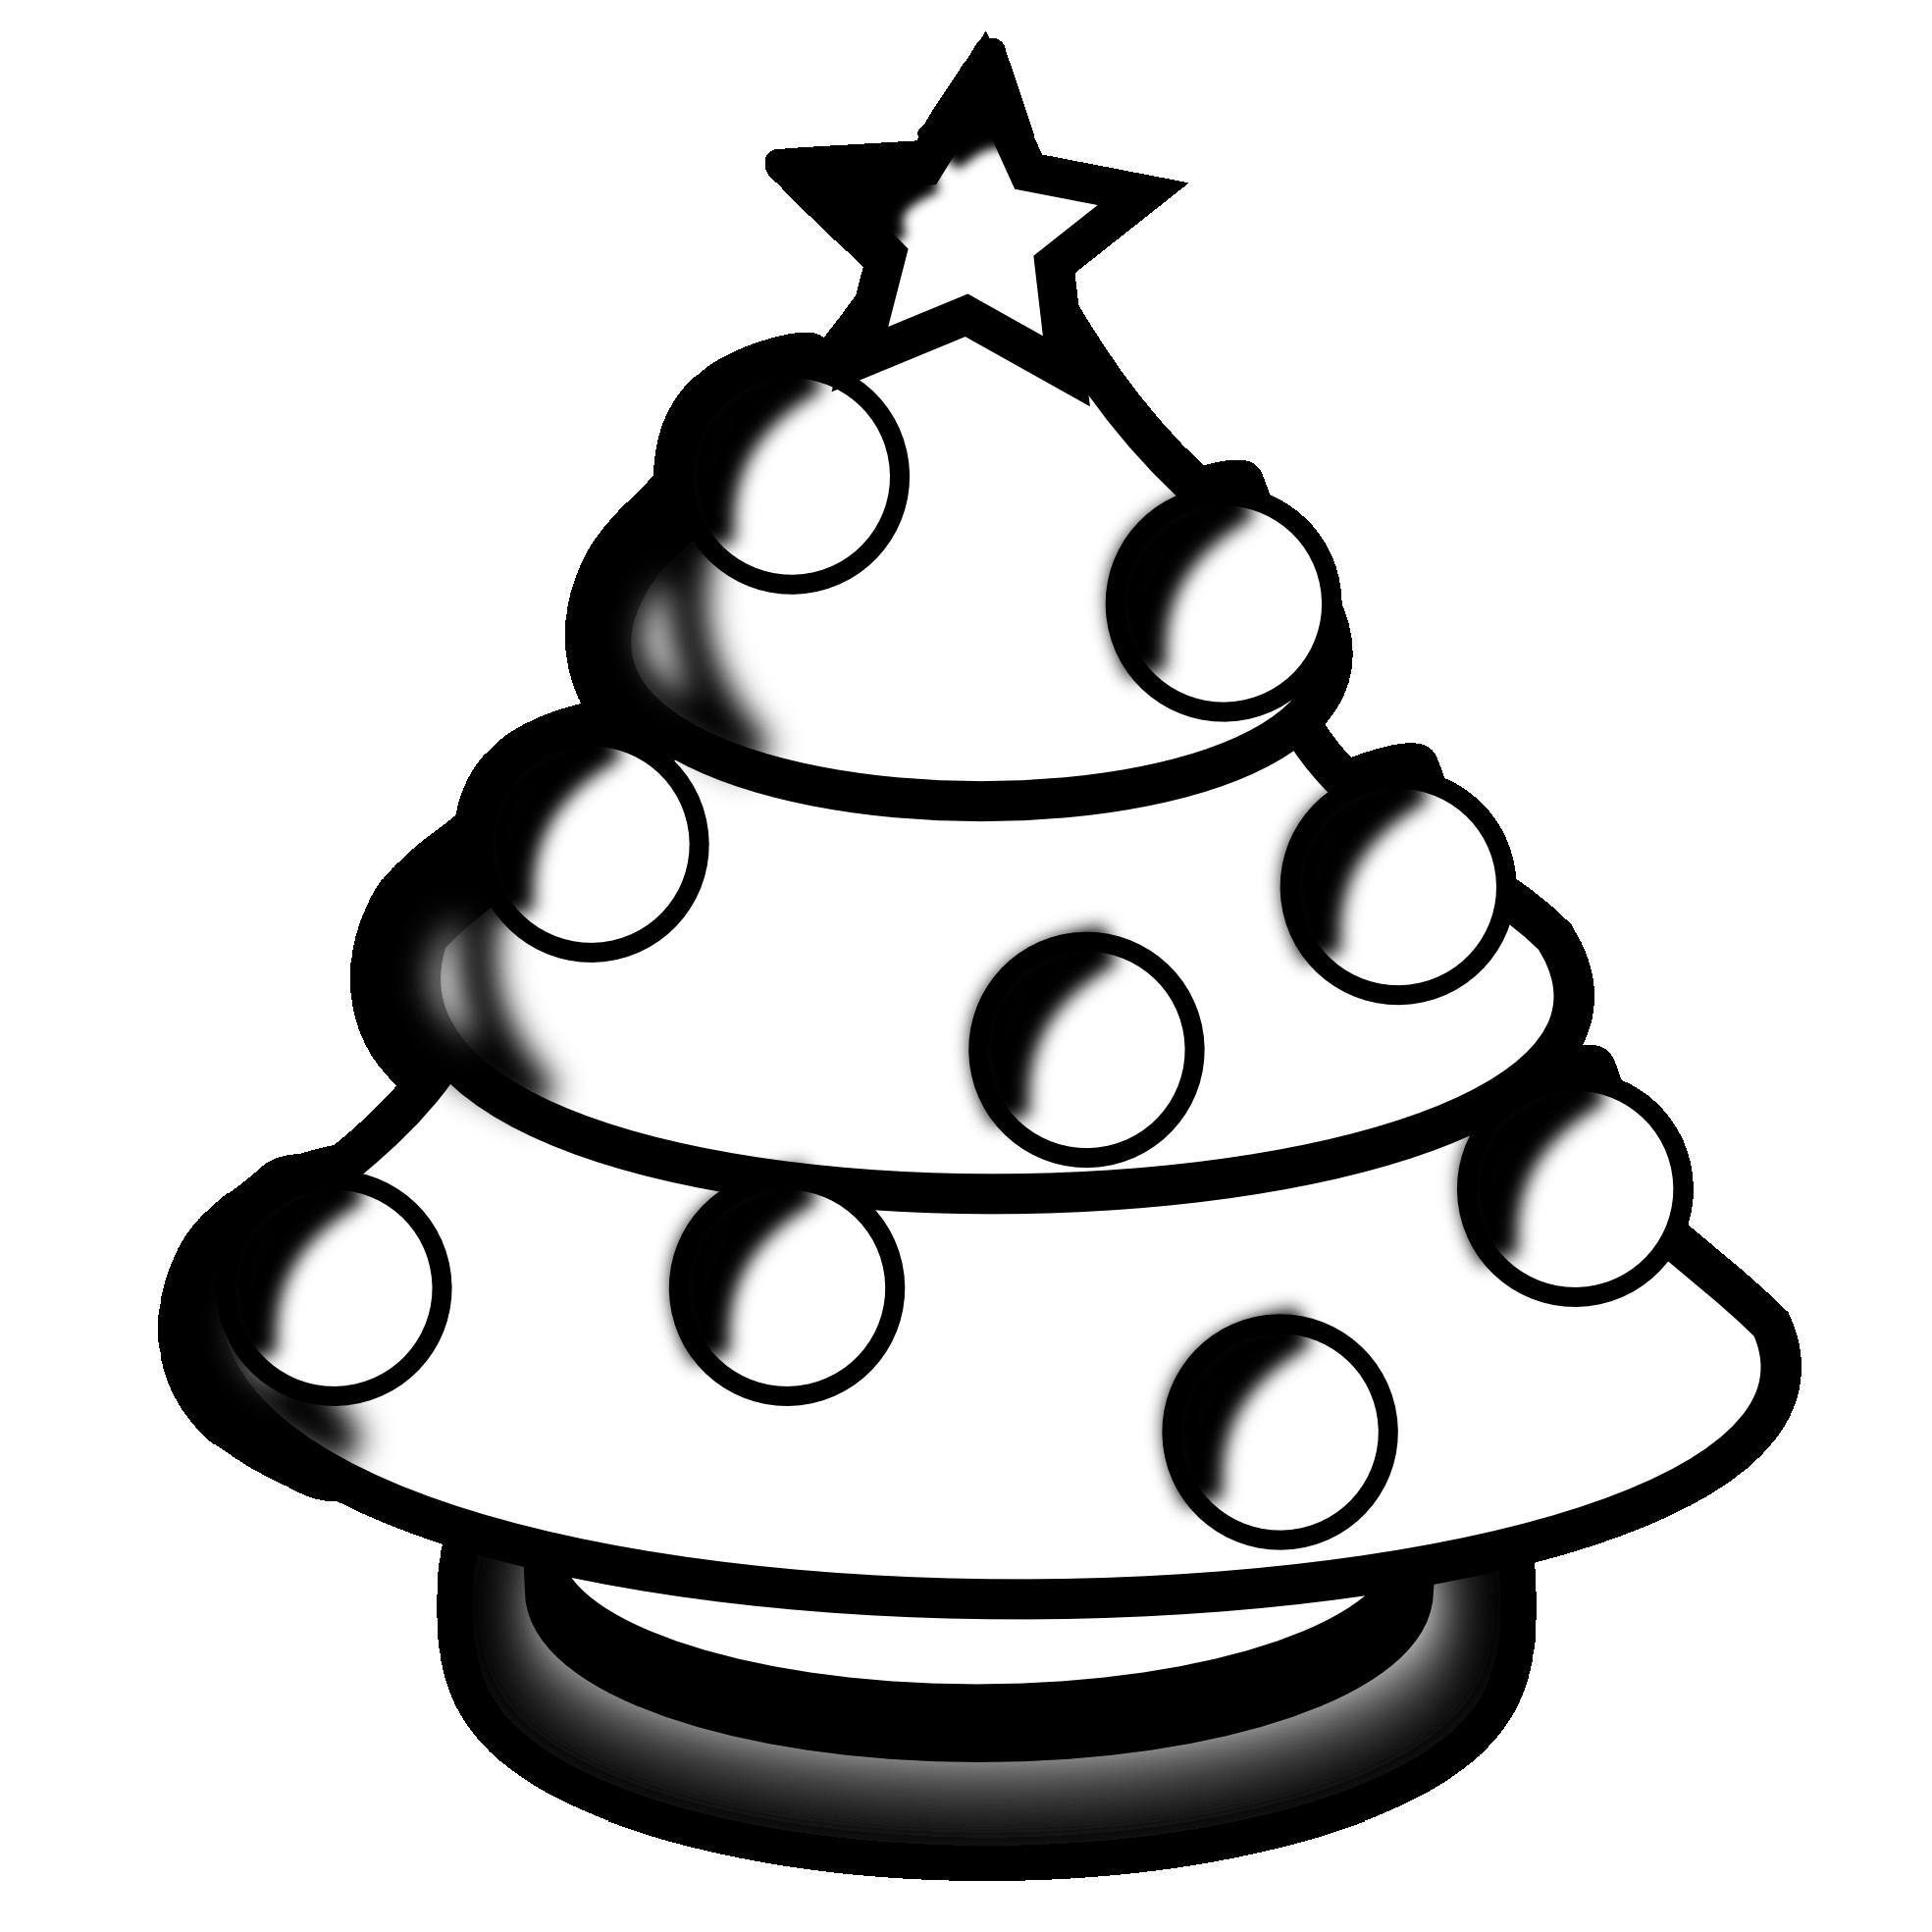 Christmas Tree Black And White Christmas Tree Outline Clipart Wikiclipart Christmas Clipart Clip Art White Christmas